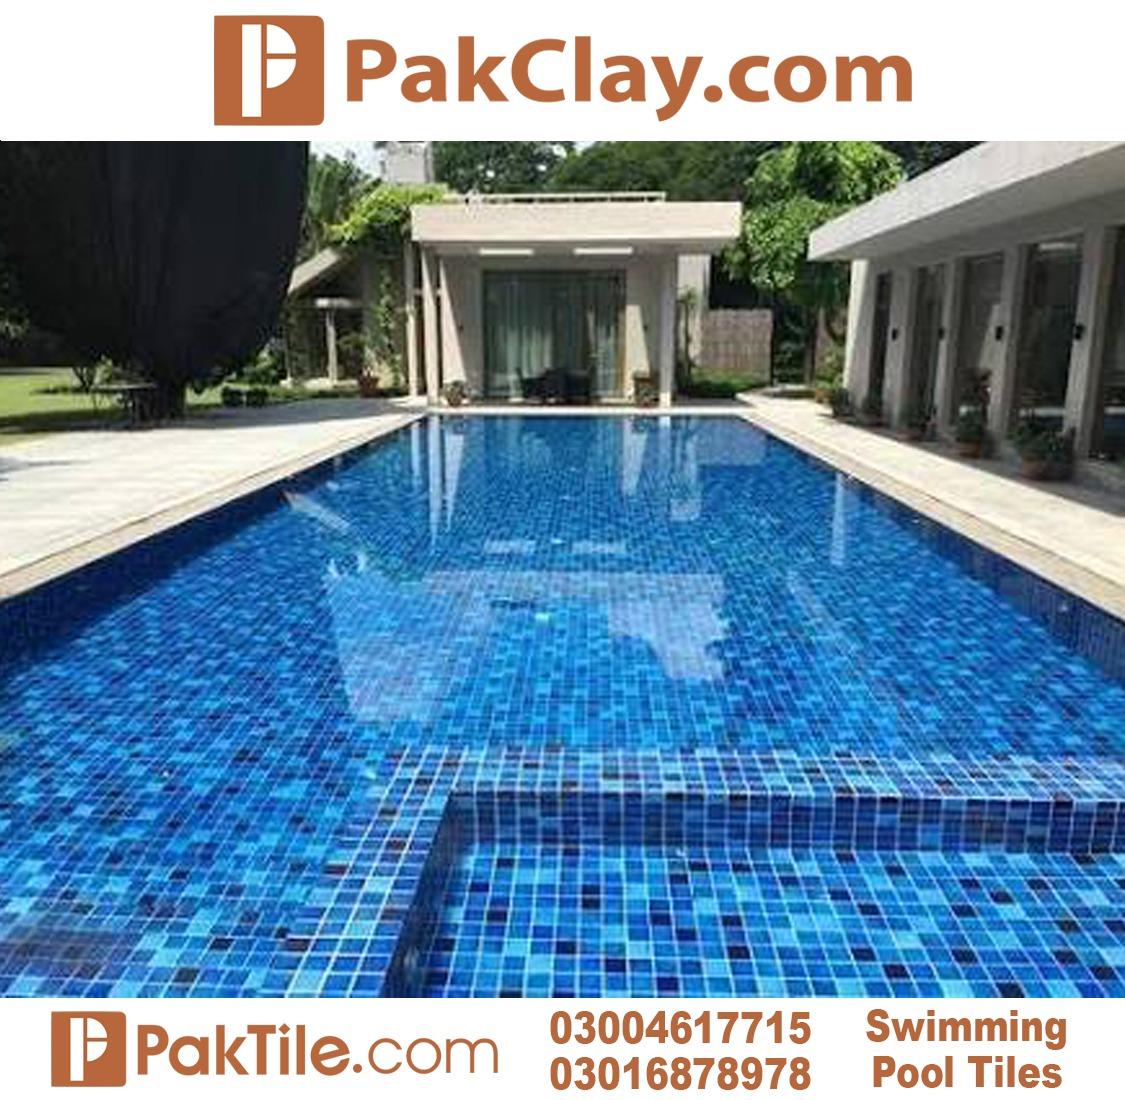 Outdoor swimming pool tiles Ceramic Mosaic Pool Tiles Design